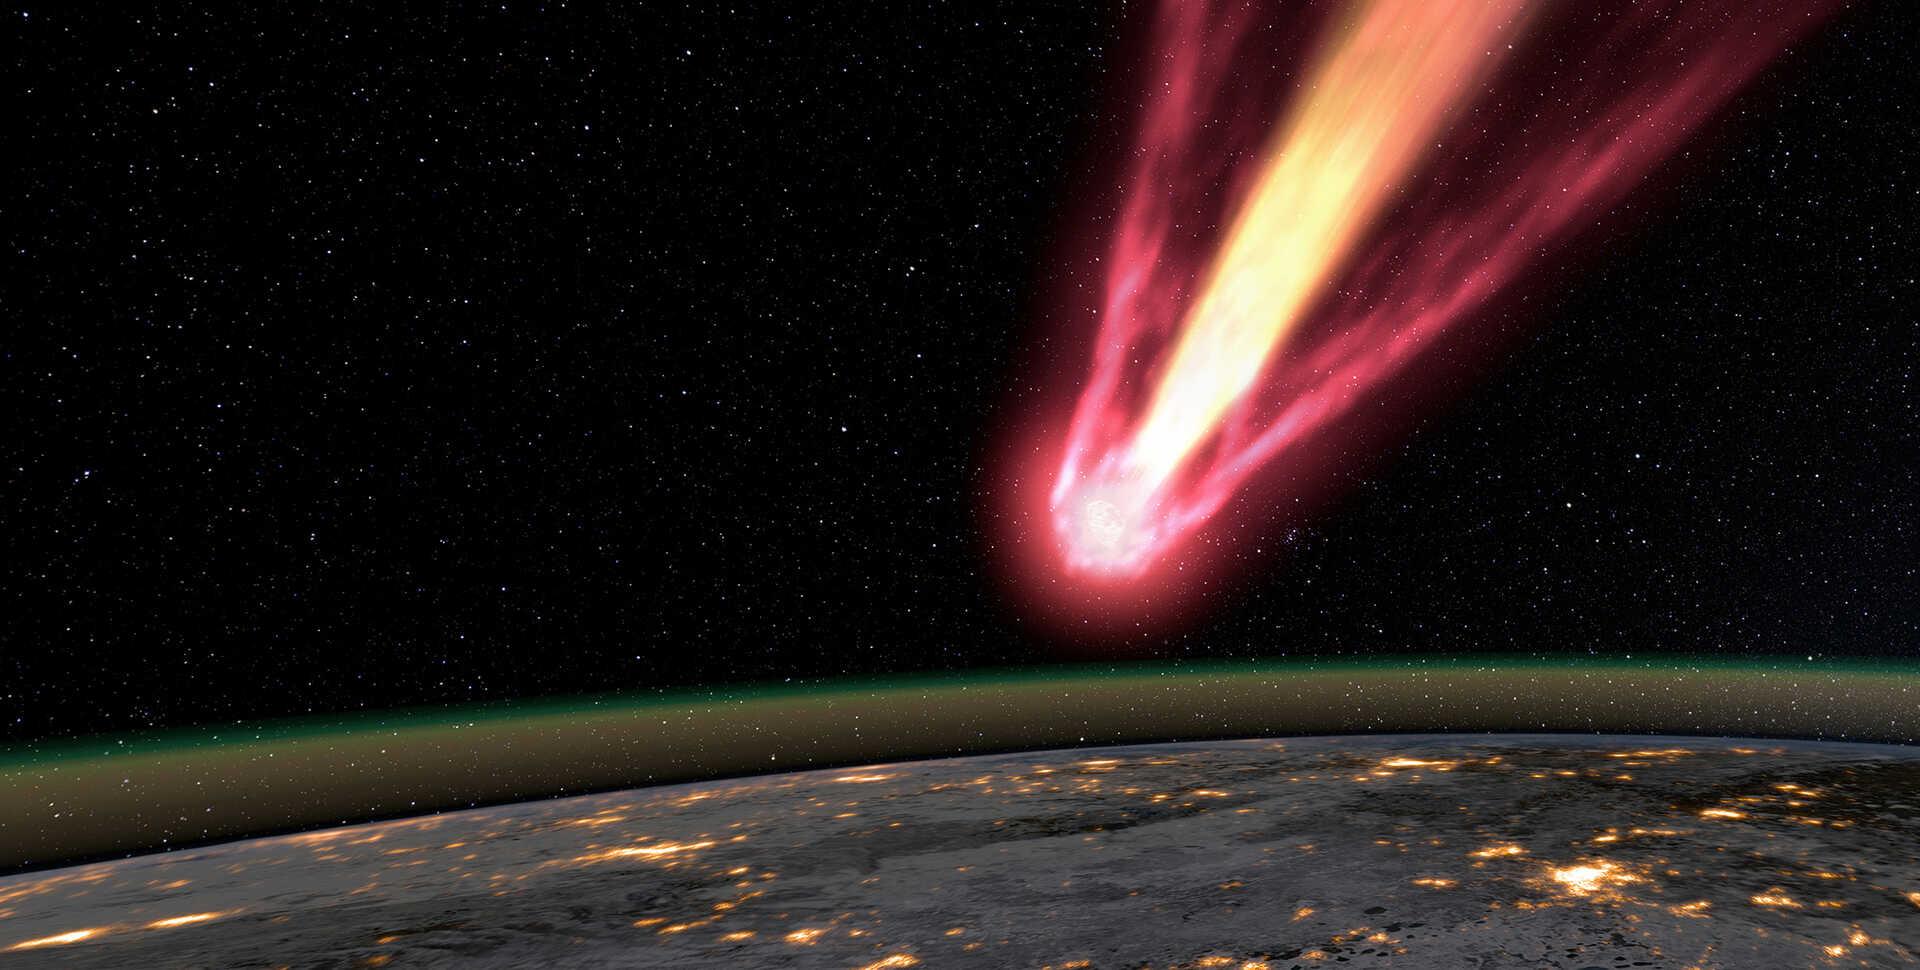 Chelyabinsk meteor Image Credit: California Academy of Sciences Visualization StudioChelyabinsk. Image